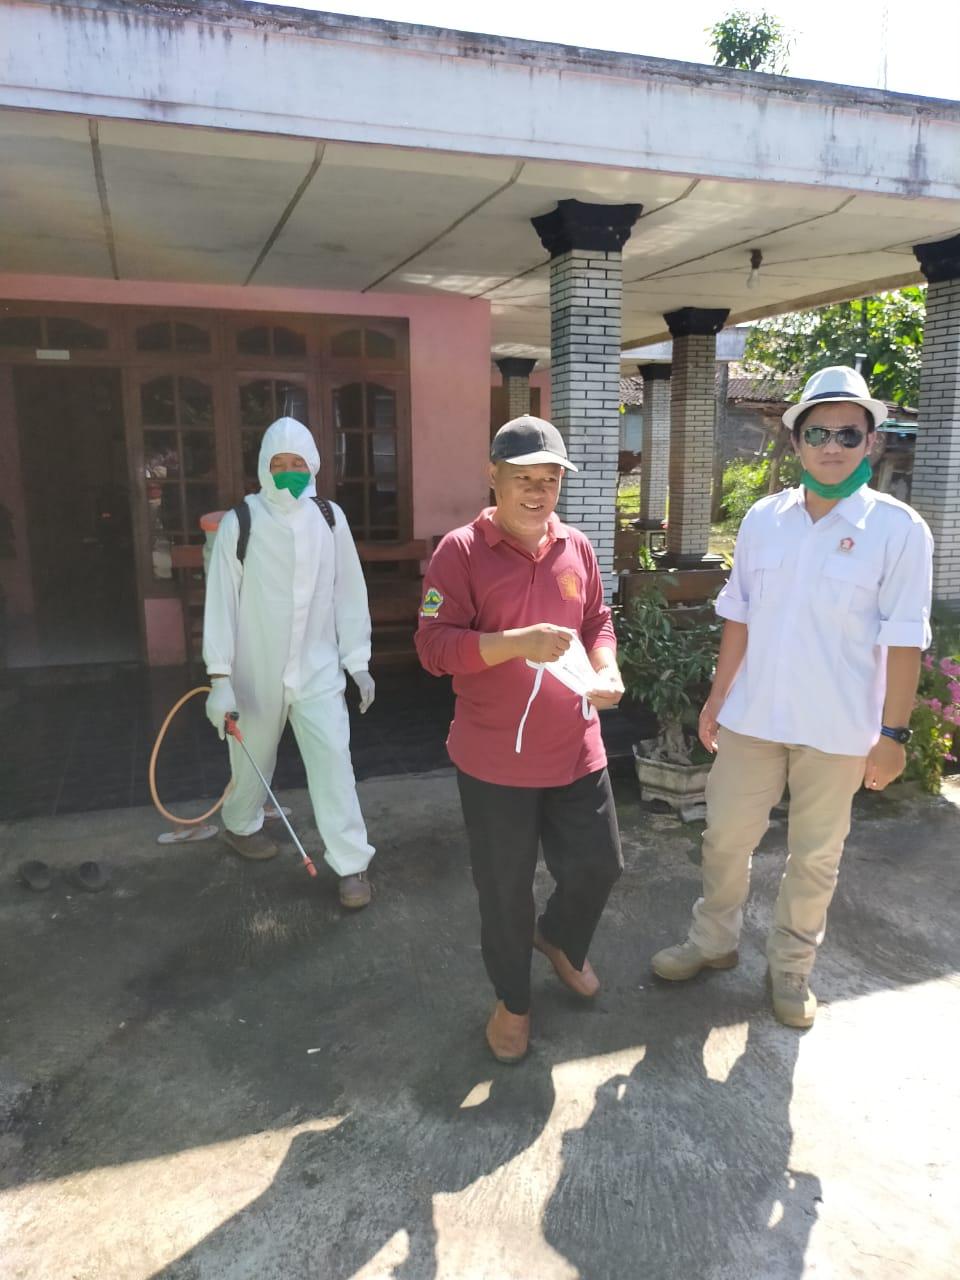 Kesehatan Indonesia Raya (KESIRA) Partai Gerakan Indonesia Raya (Gerindra) Kabupaten Semarang Provinsi Jawa Tengah (Jateng) Republik Indonesia (RI) atau Negara Kesatuan Republik Indonesia (NKRI)